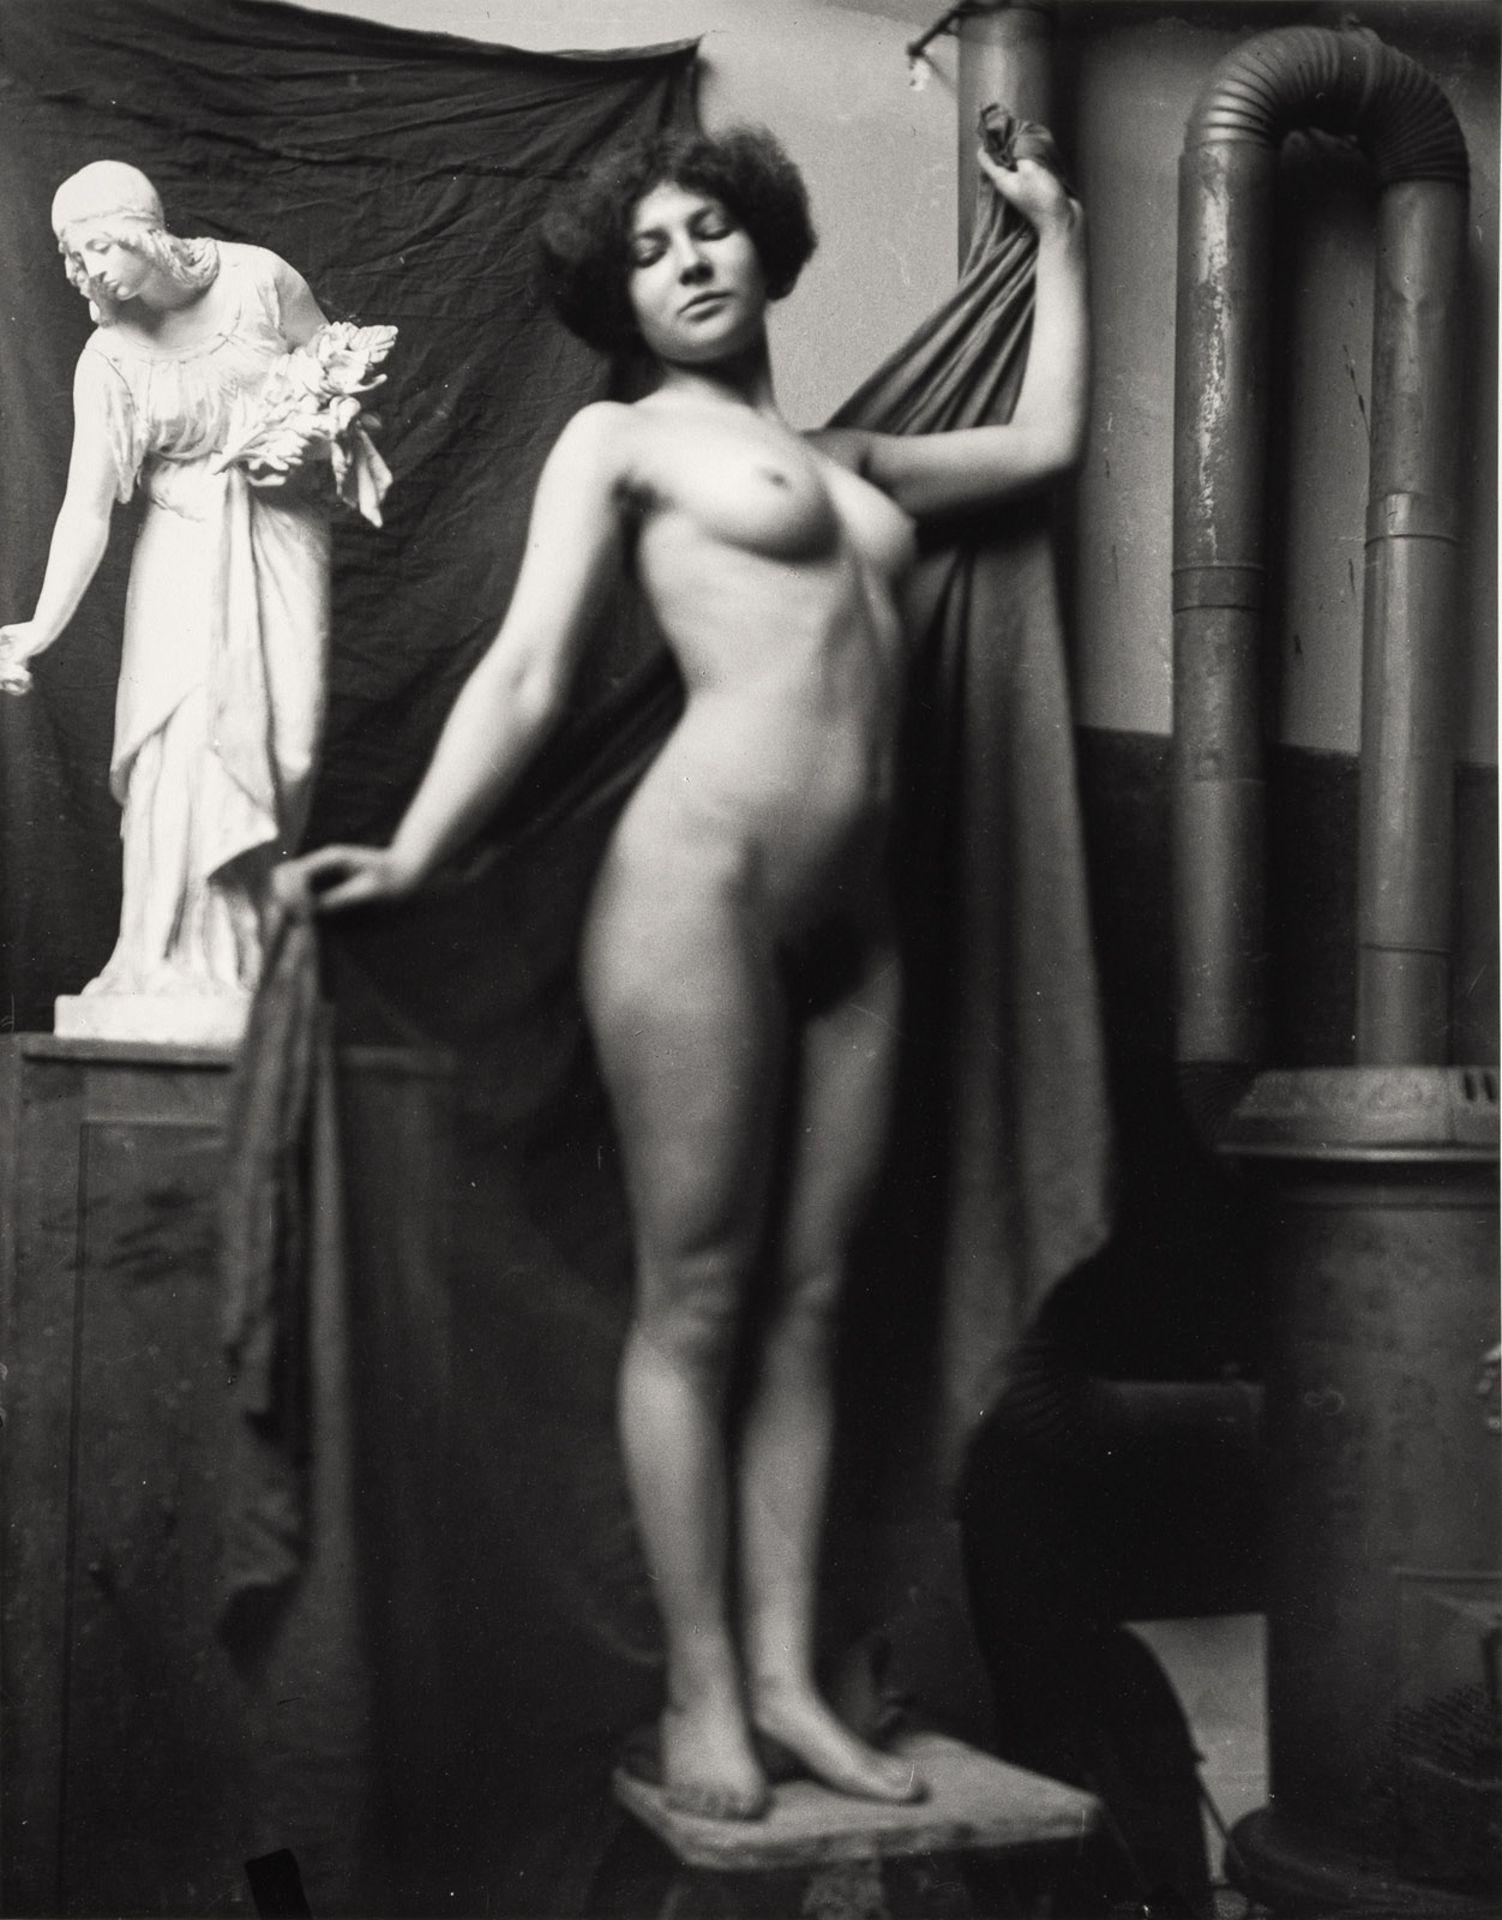 Zille, Heinrich - Image 5 of 8